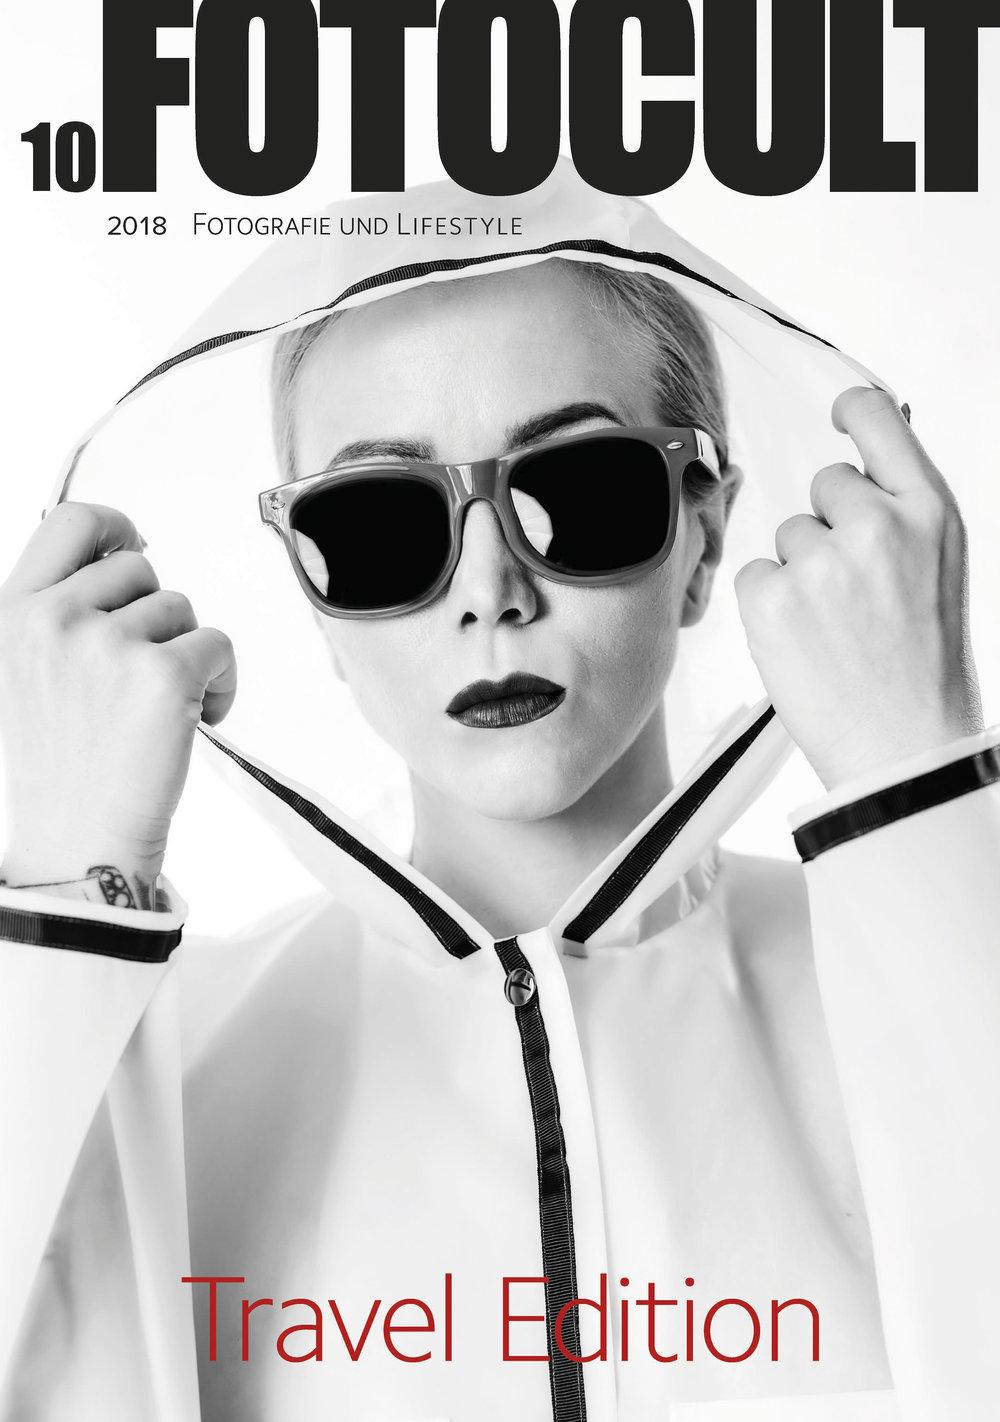 FOTOCULT Magazin Ausgabe 10